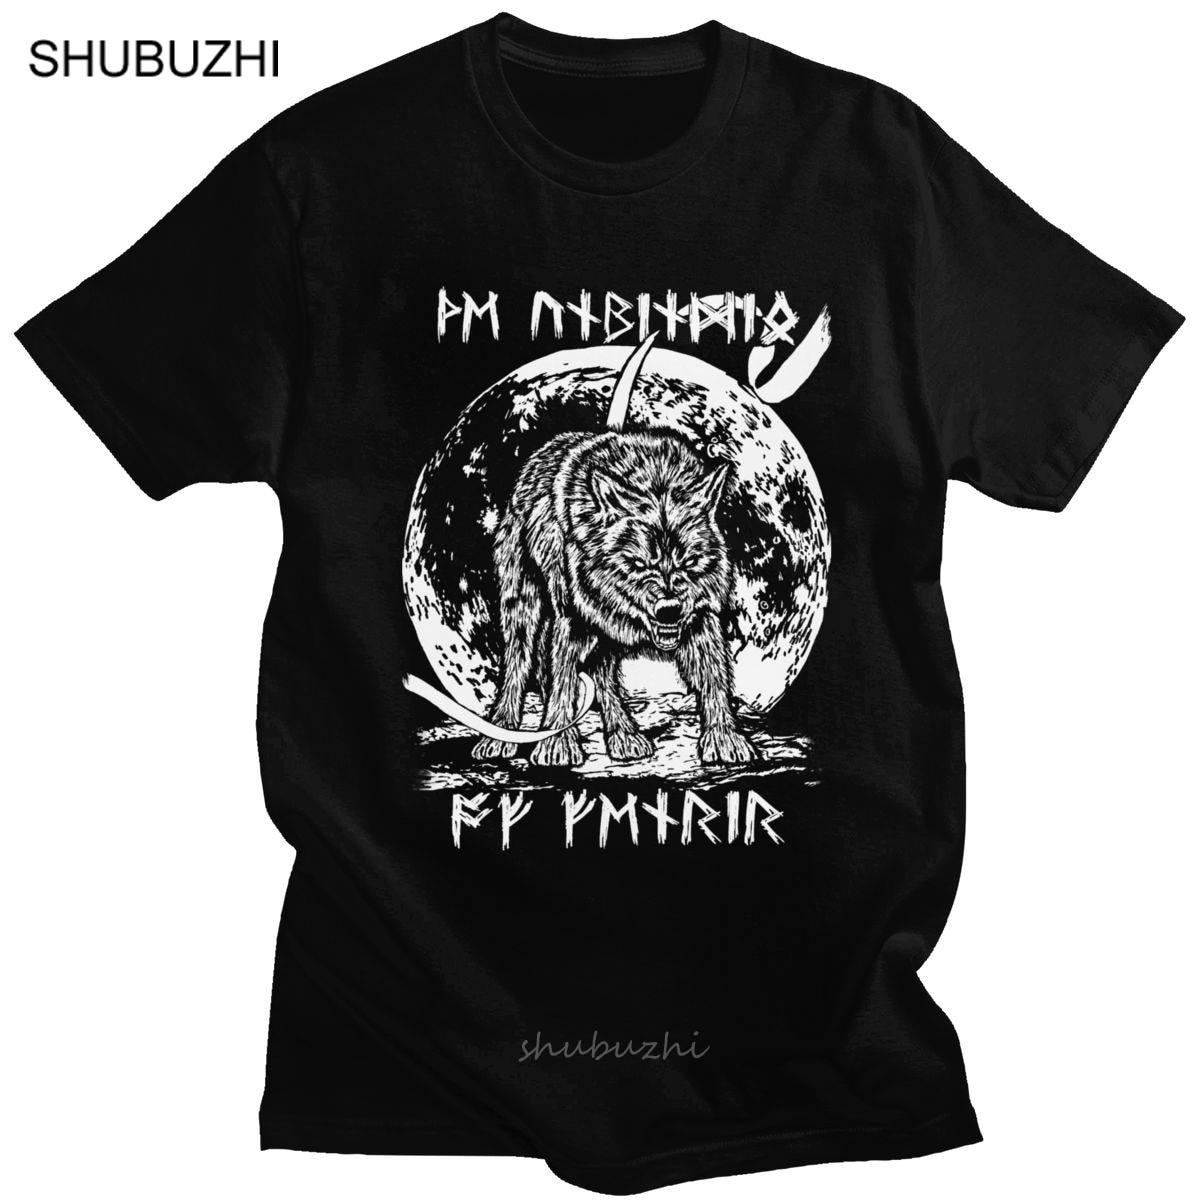 Camiseta vikinga Valhalla Odín, Camiseta de algodón con estampado de Luna para hombre, camiseta para el hijo de Fenrir Loki, Camiseta estampada de manga corta, Tops de vikingos